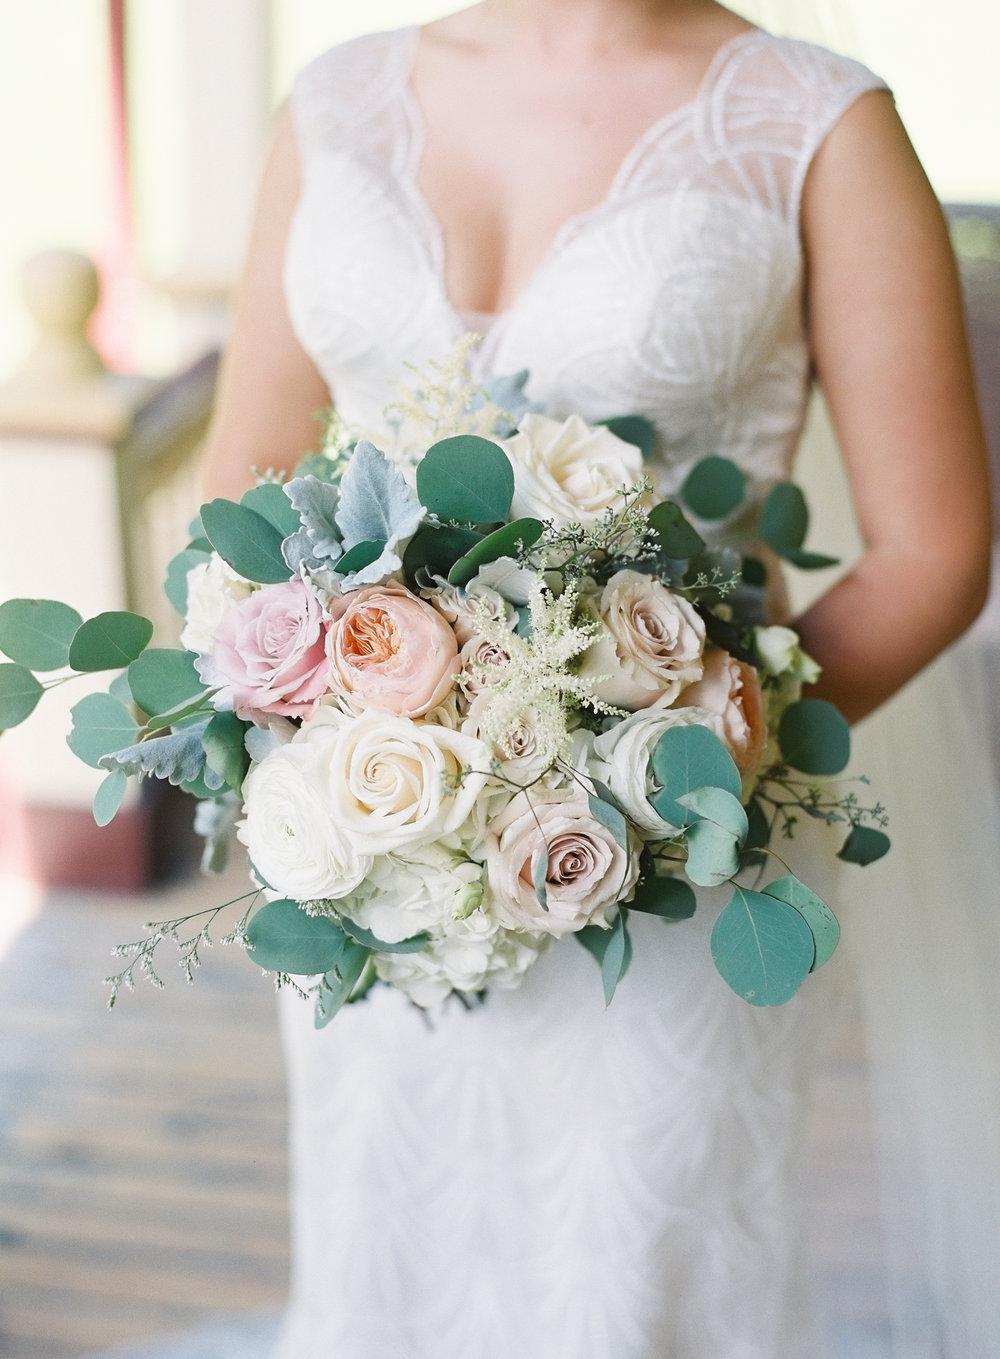 Halifax Wedding Photographer, Jacqueline Anne Photography